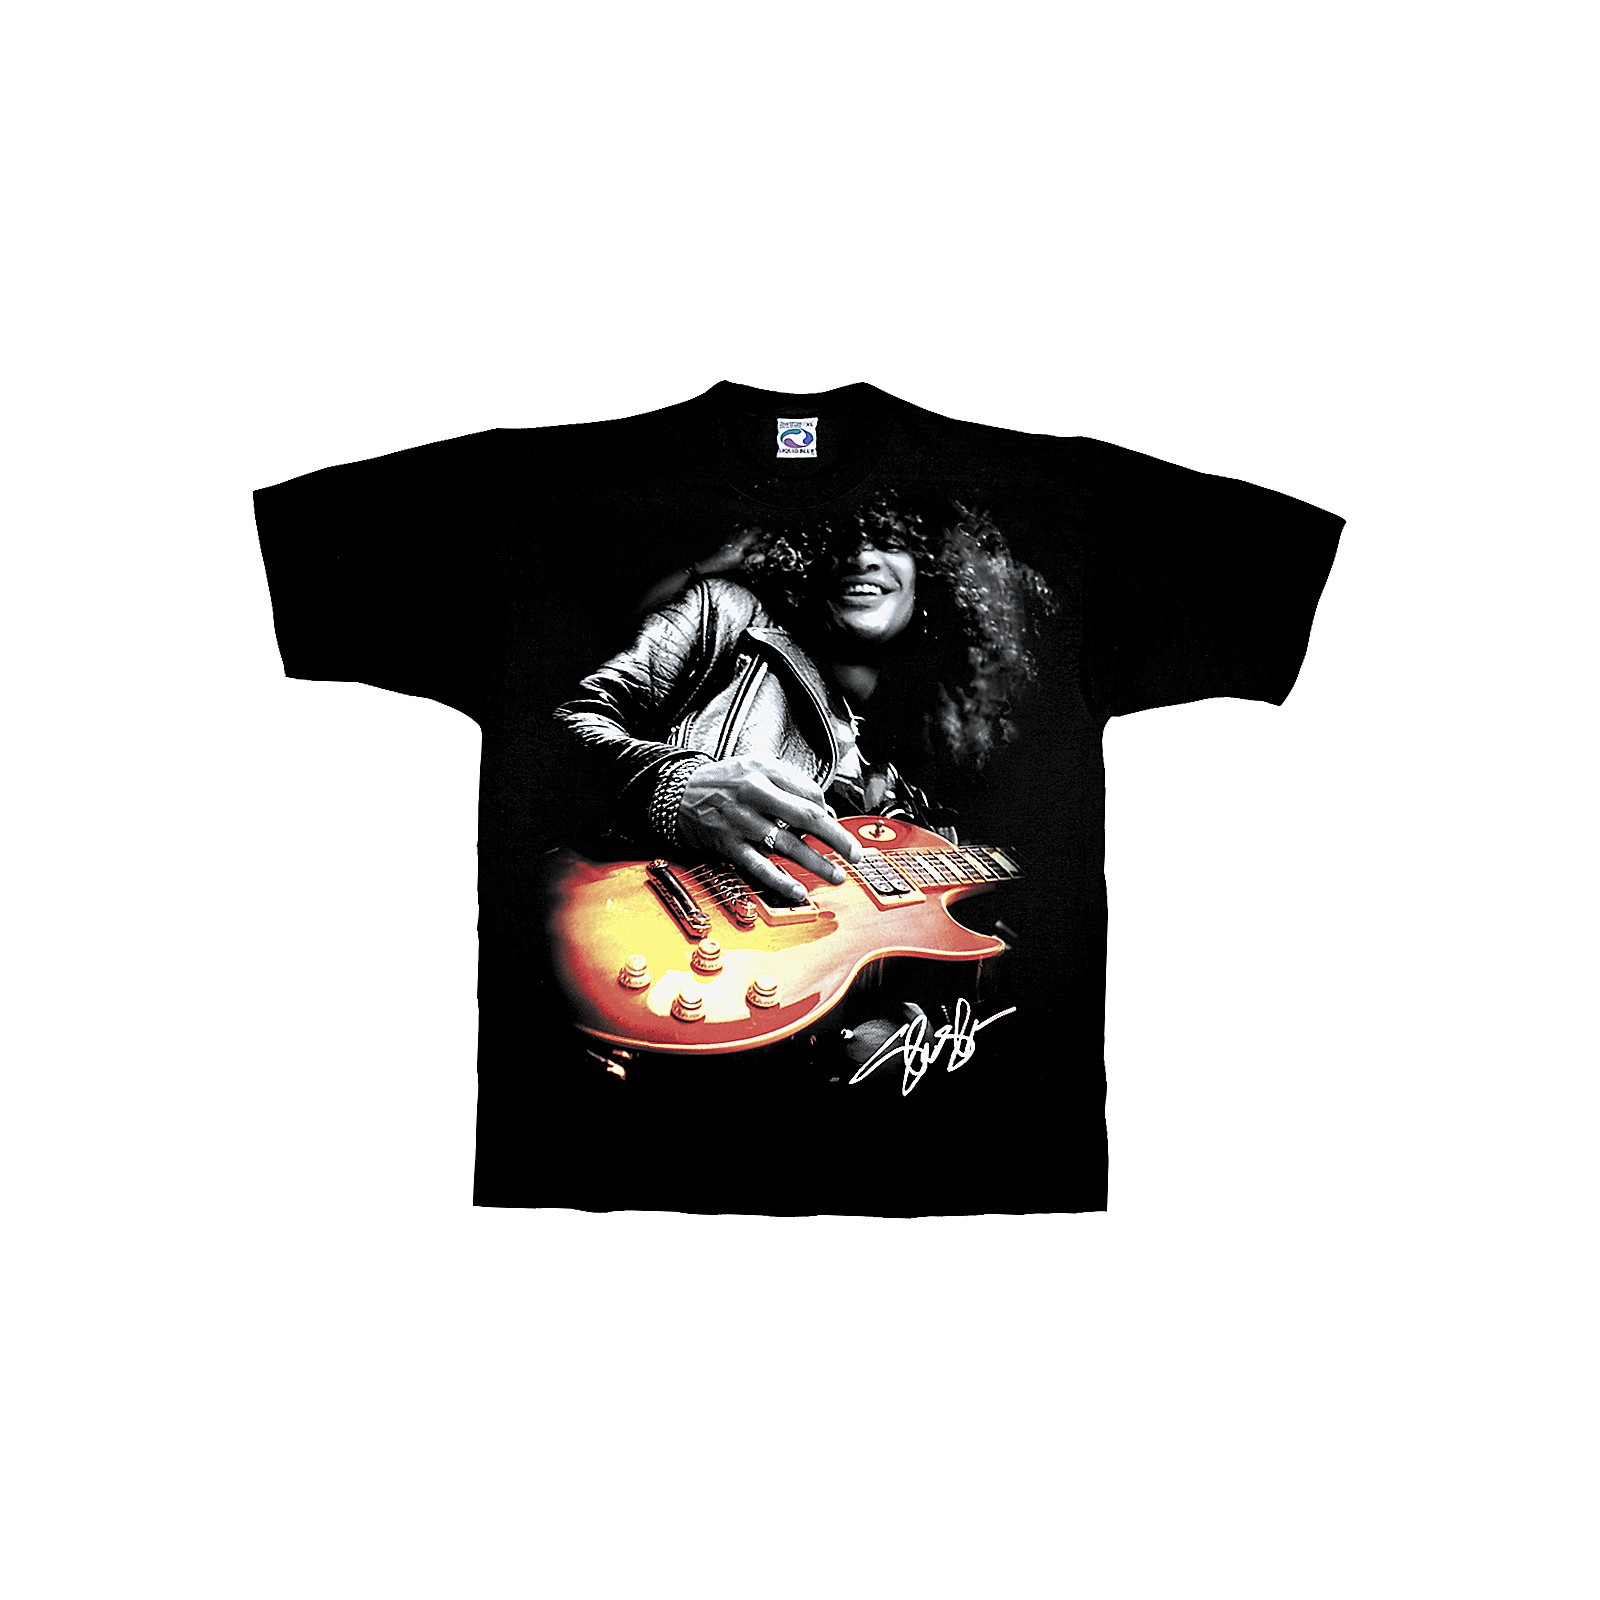 Slash Playing Guitar T-Shirt